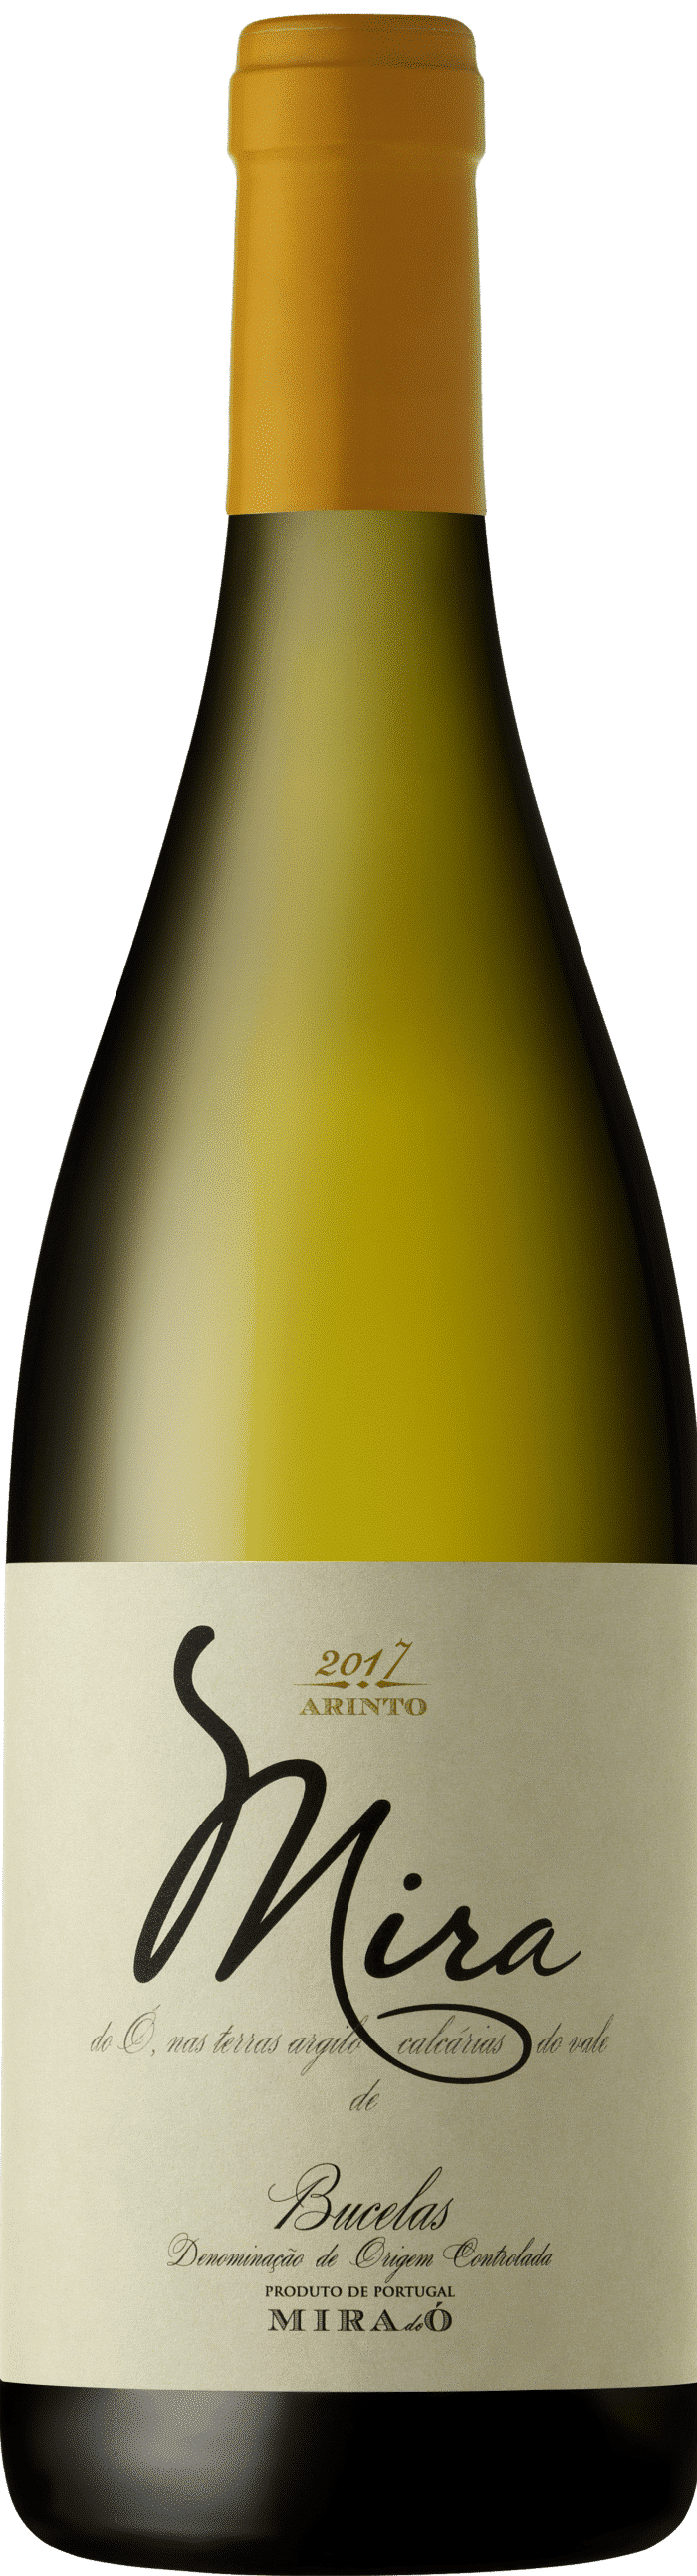 Arinto Mira do O | Portugal | gemaakt van de druif: Arinto